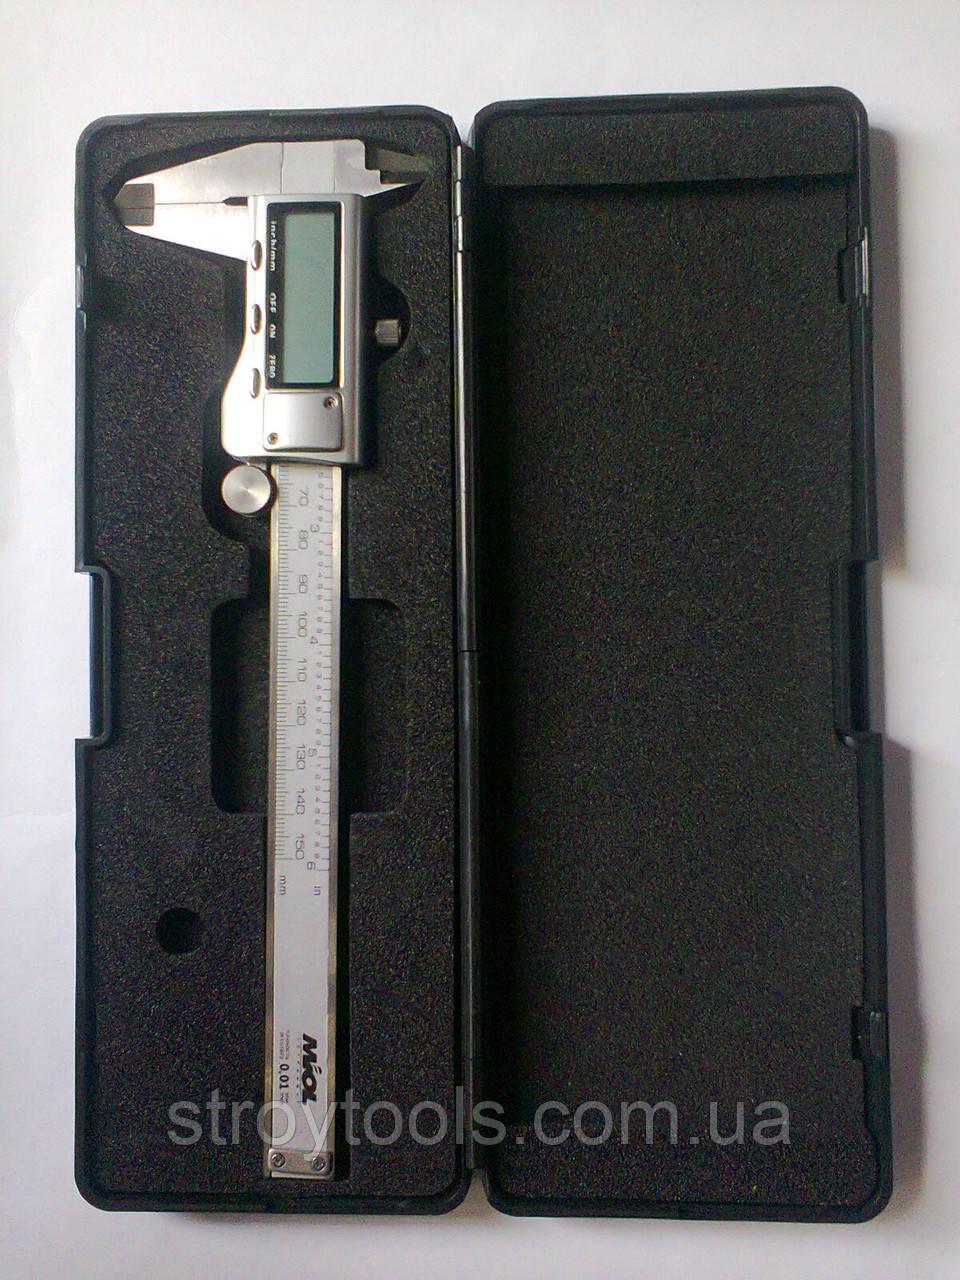 Штангенцыркуль с электронным отщетом  150mm. MIOL 15-241